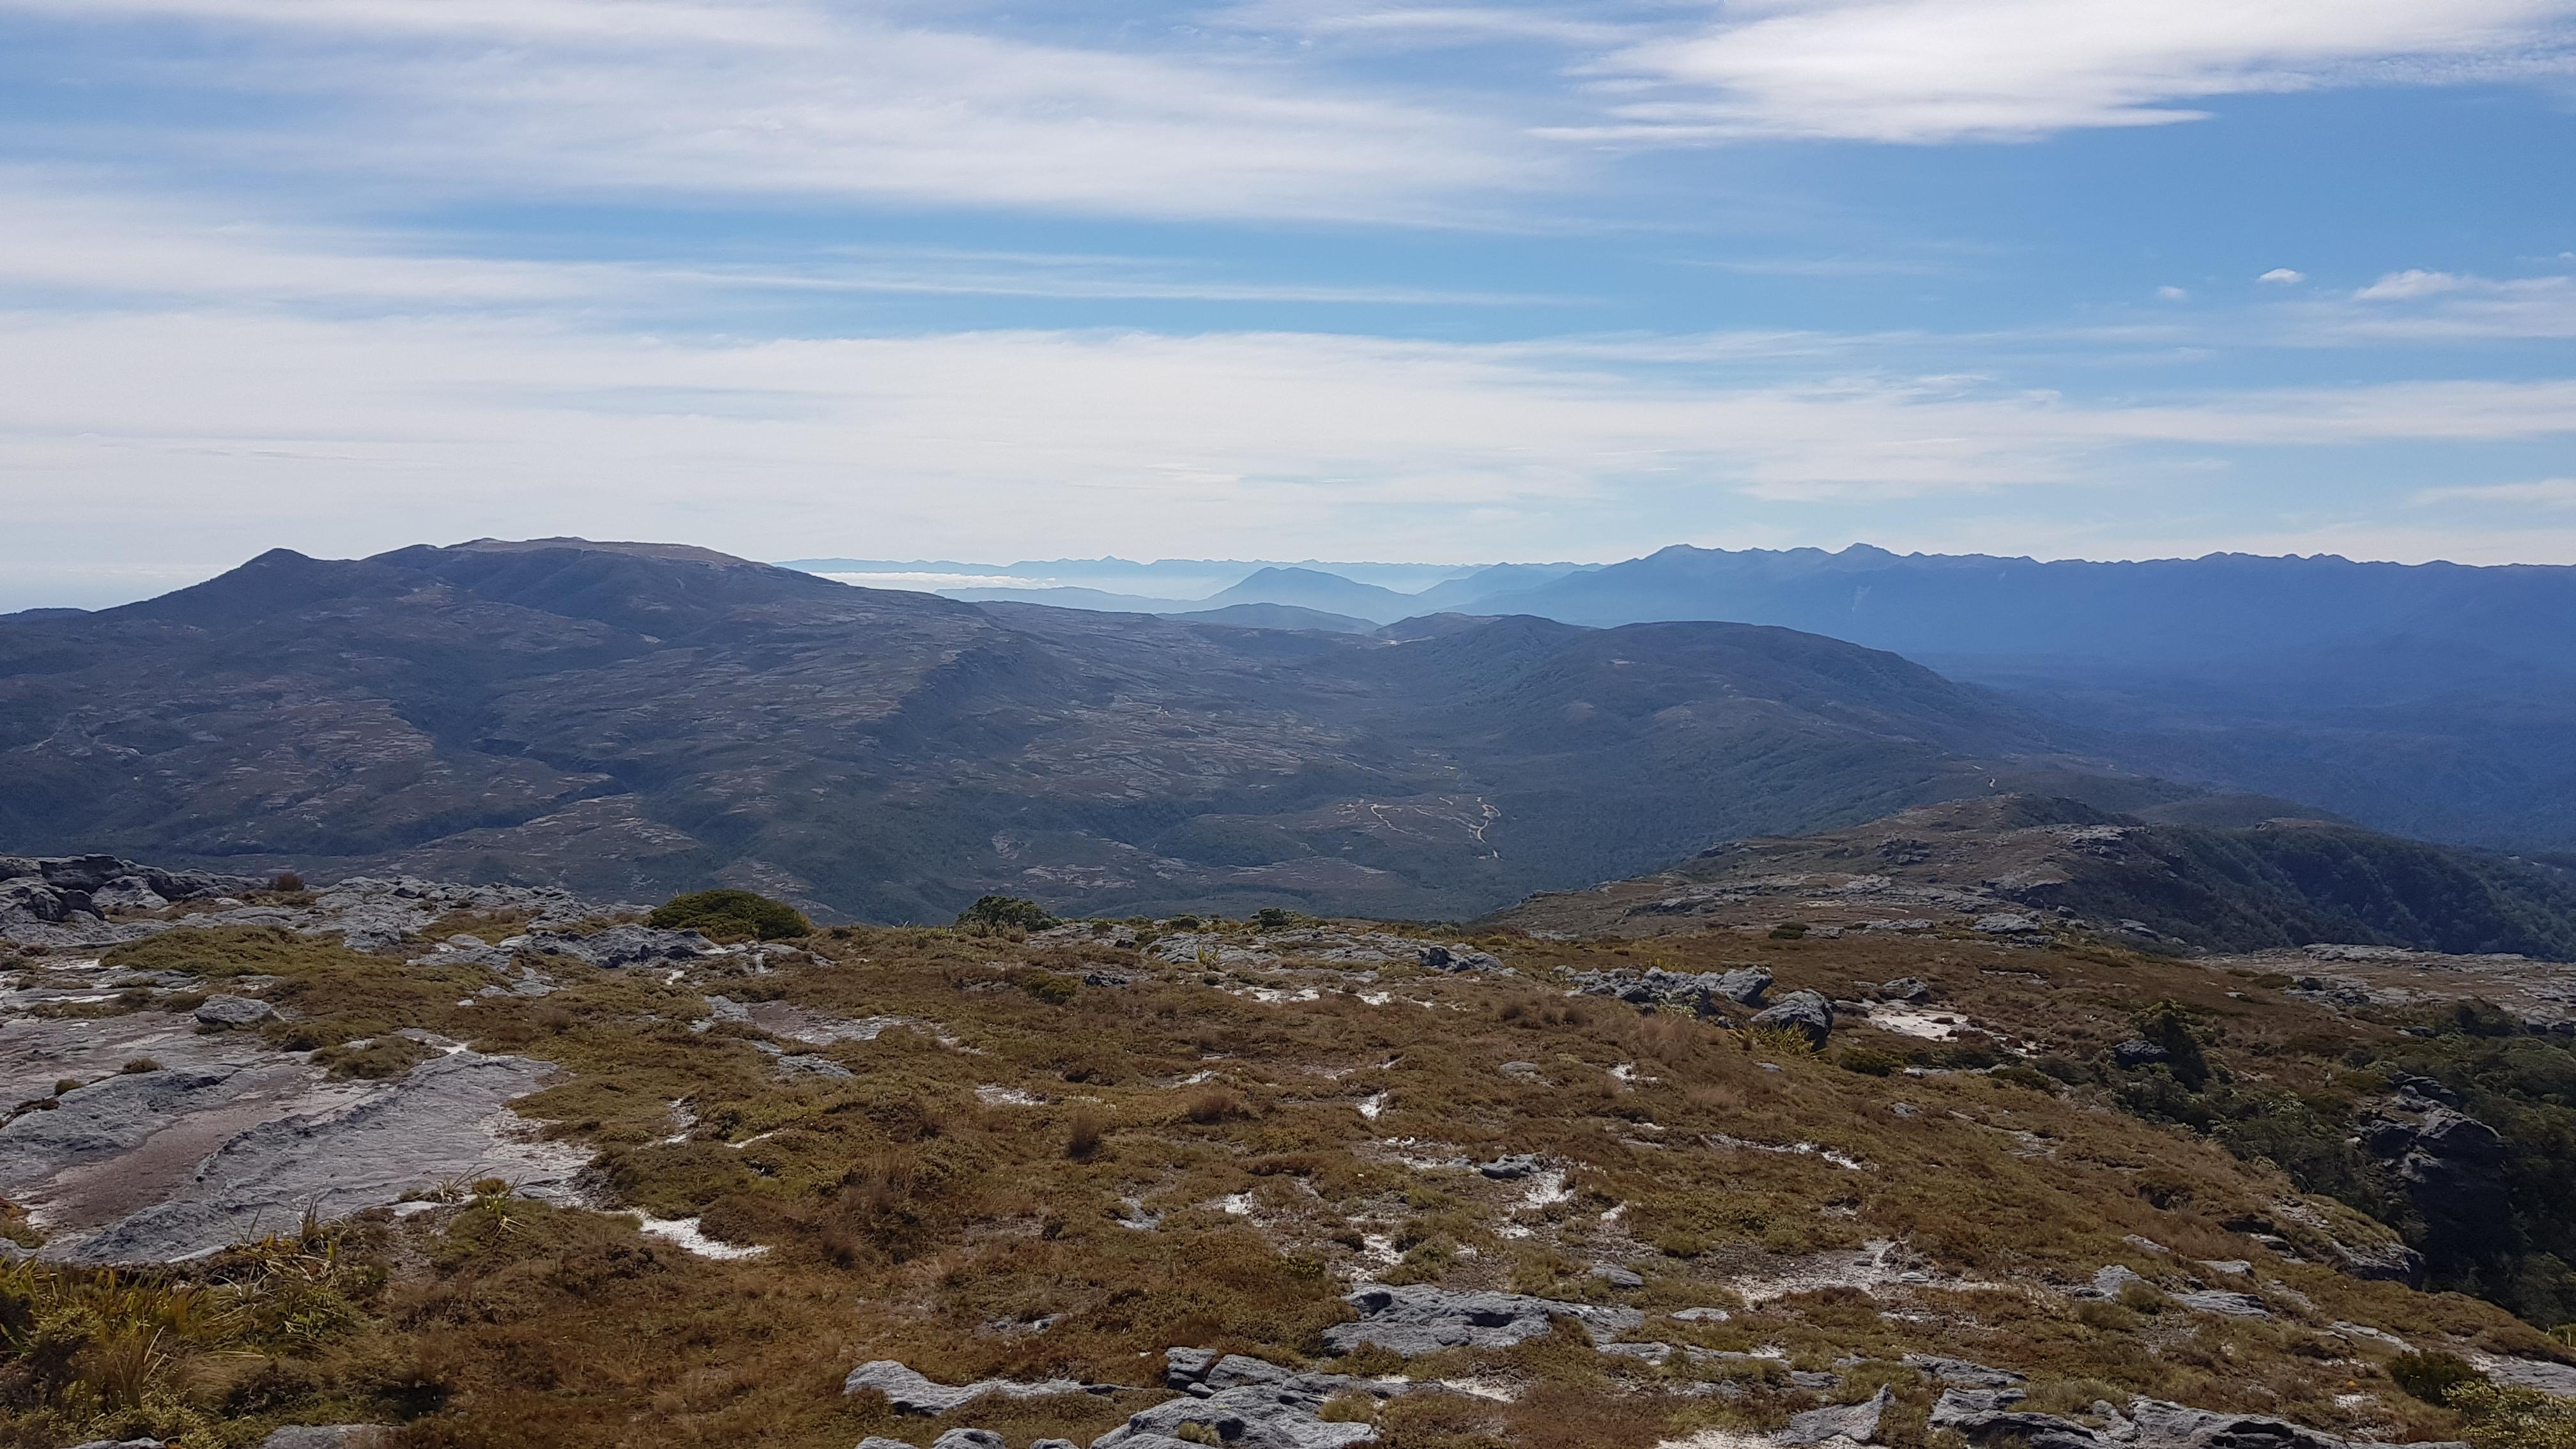 From Mt Willam across the William Range